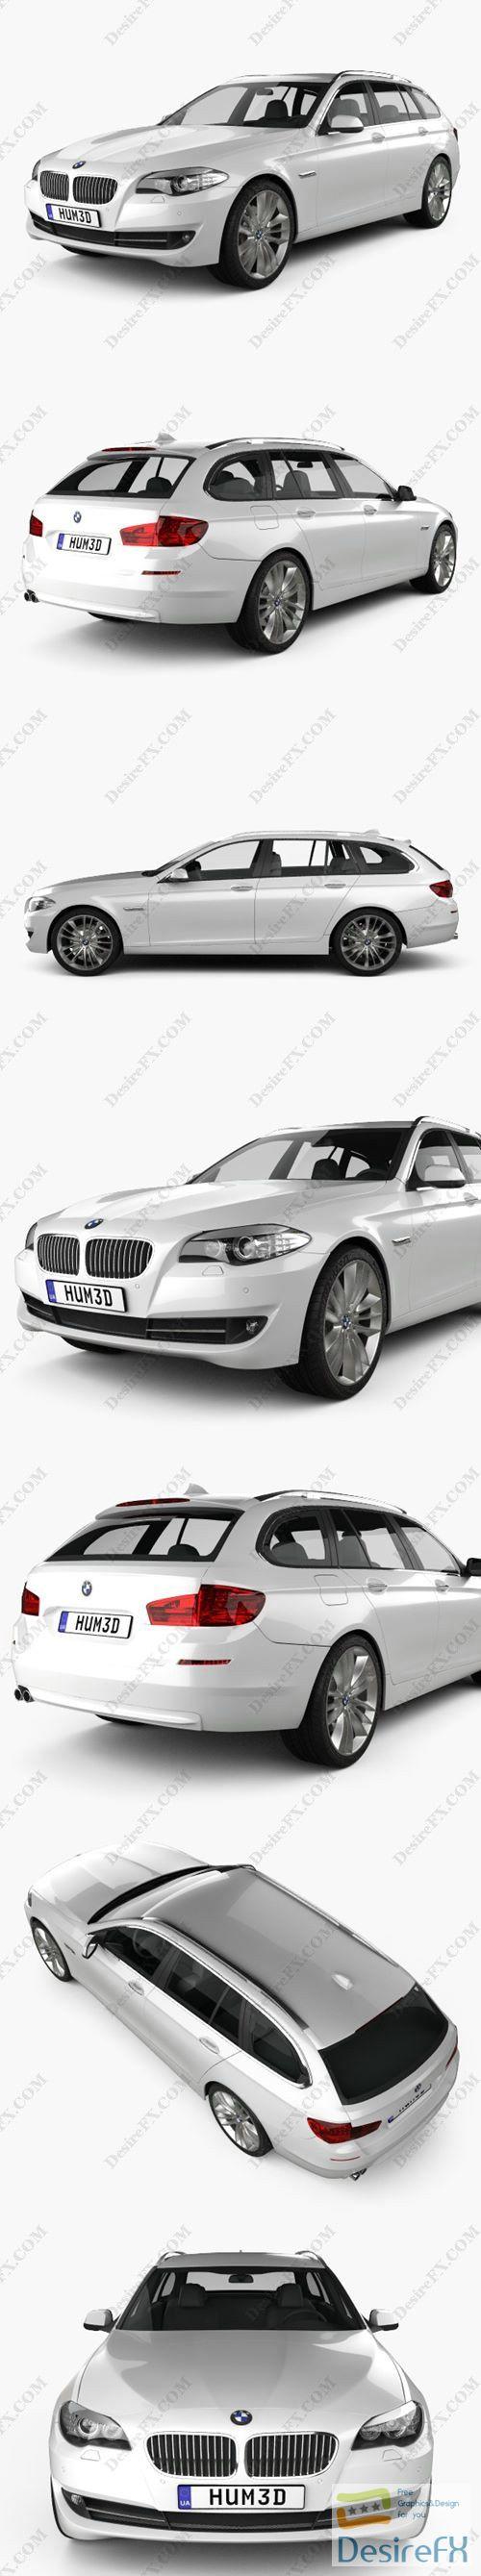 BMW 5 series touring 2011 3D Model